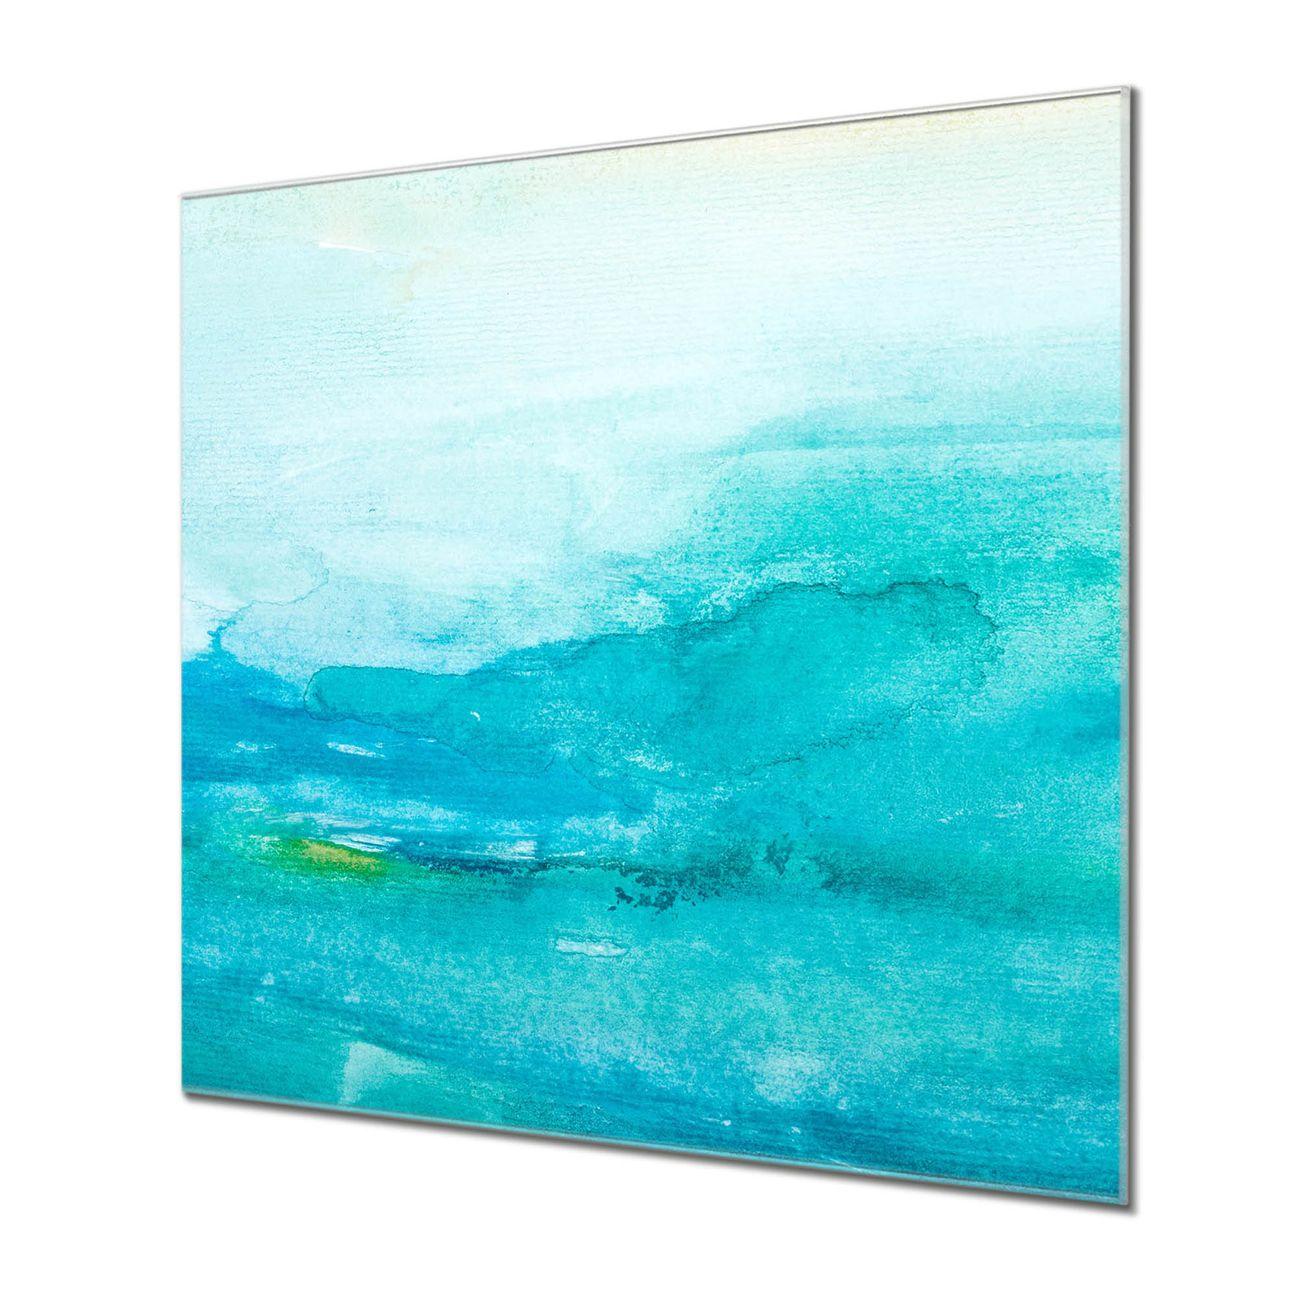 Küchenrückwand Glas Motiv Aquarell Blau